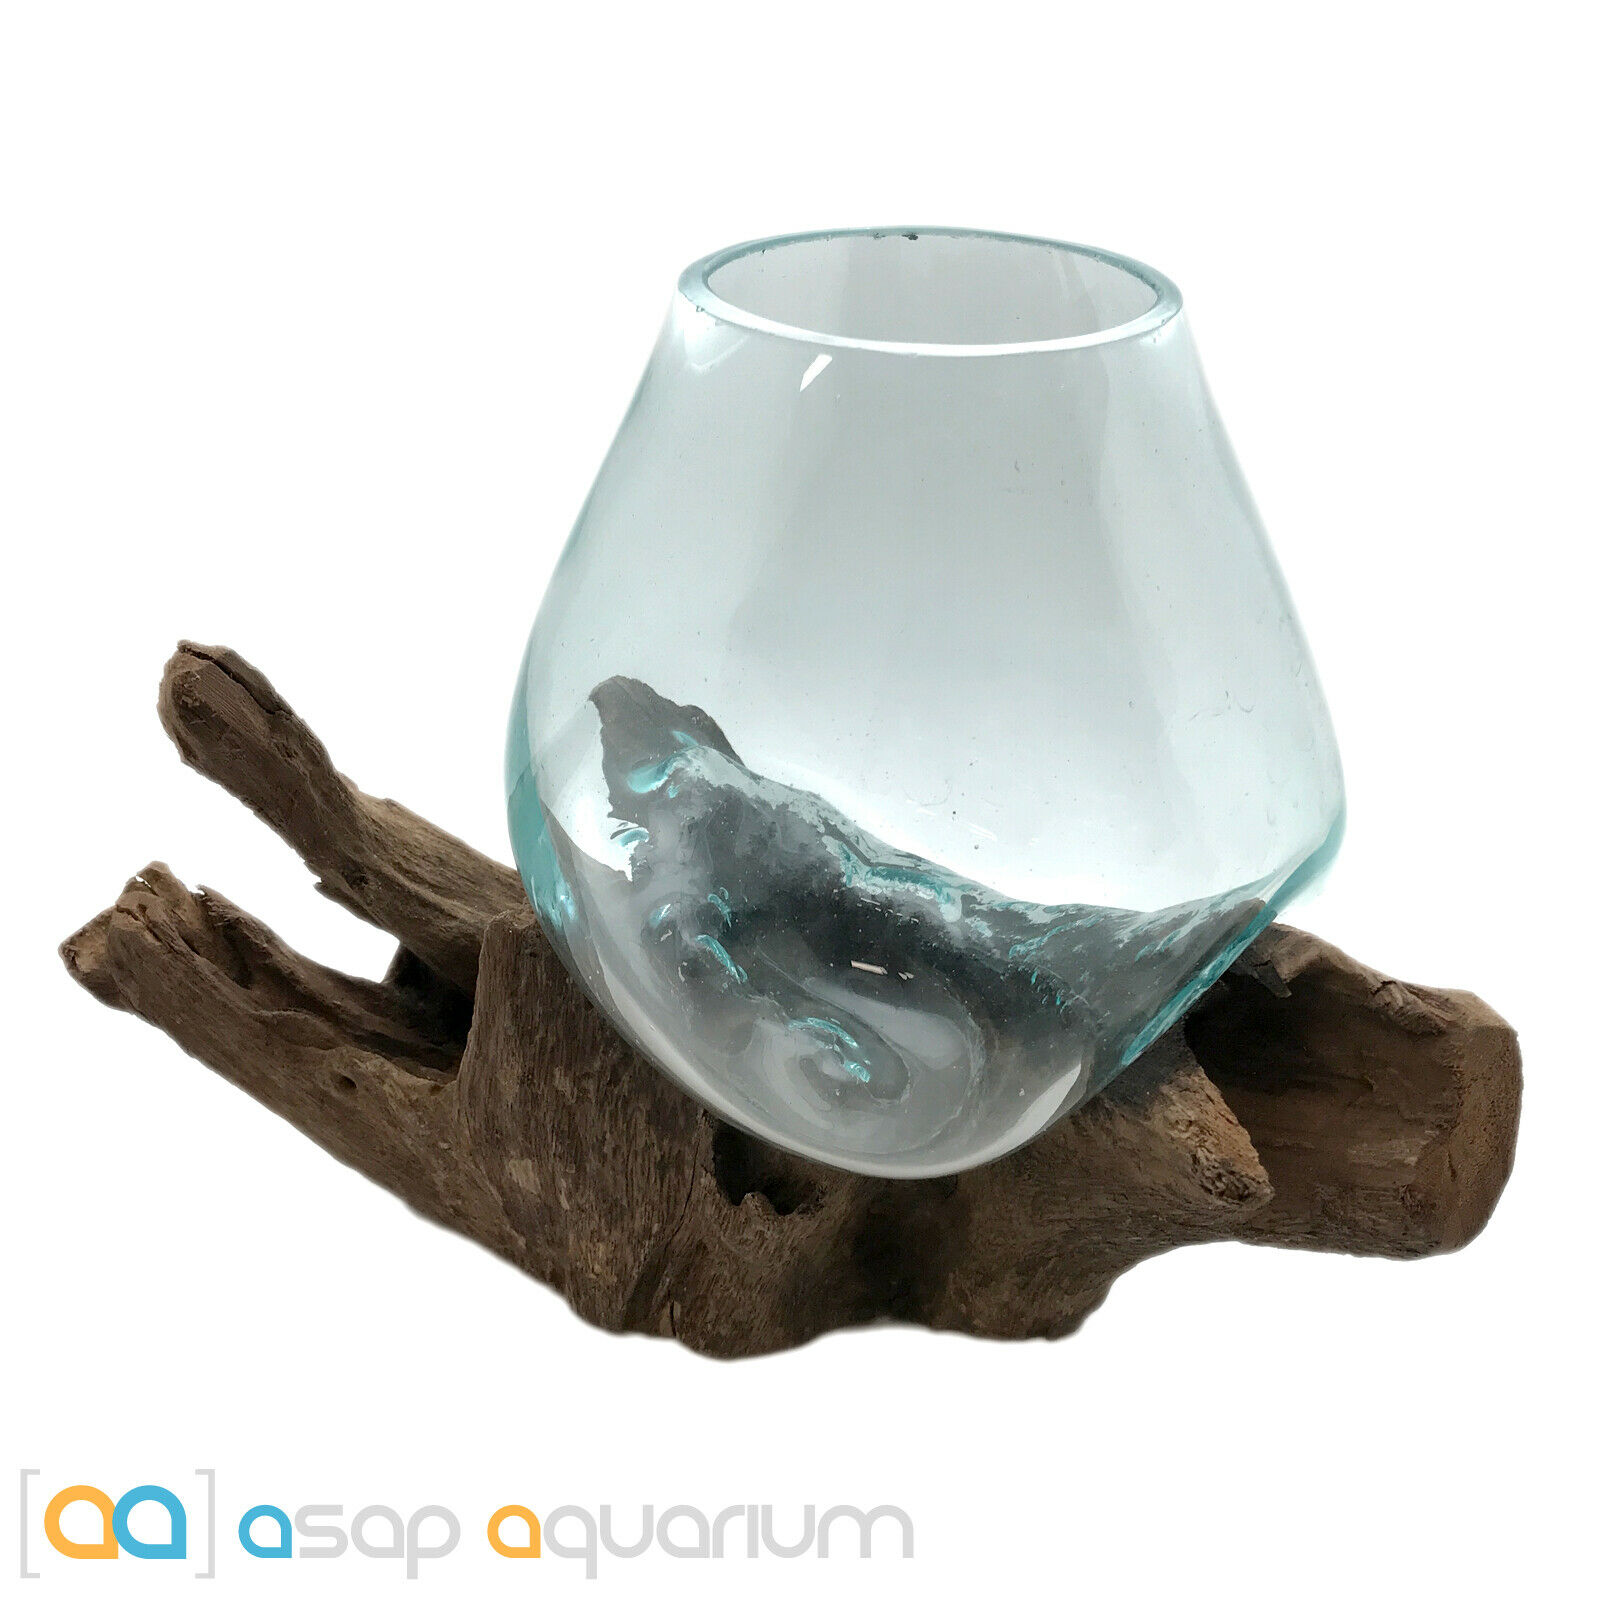 Betta Fish Bowl Unique Molten Glass on Teak Driftwood M192 Free USA Shipping